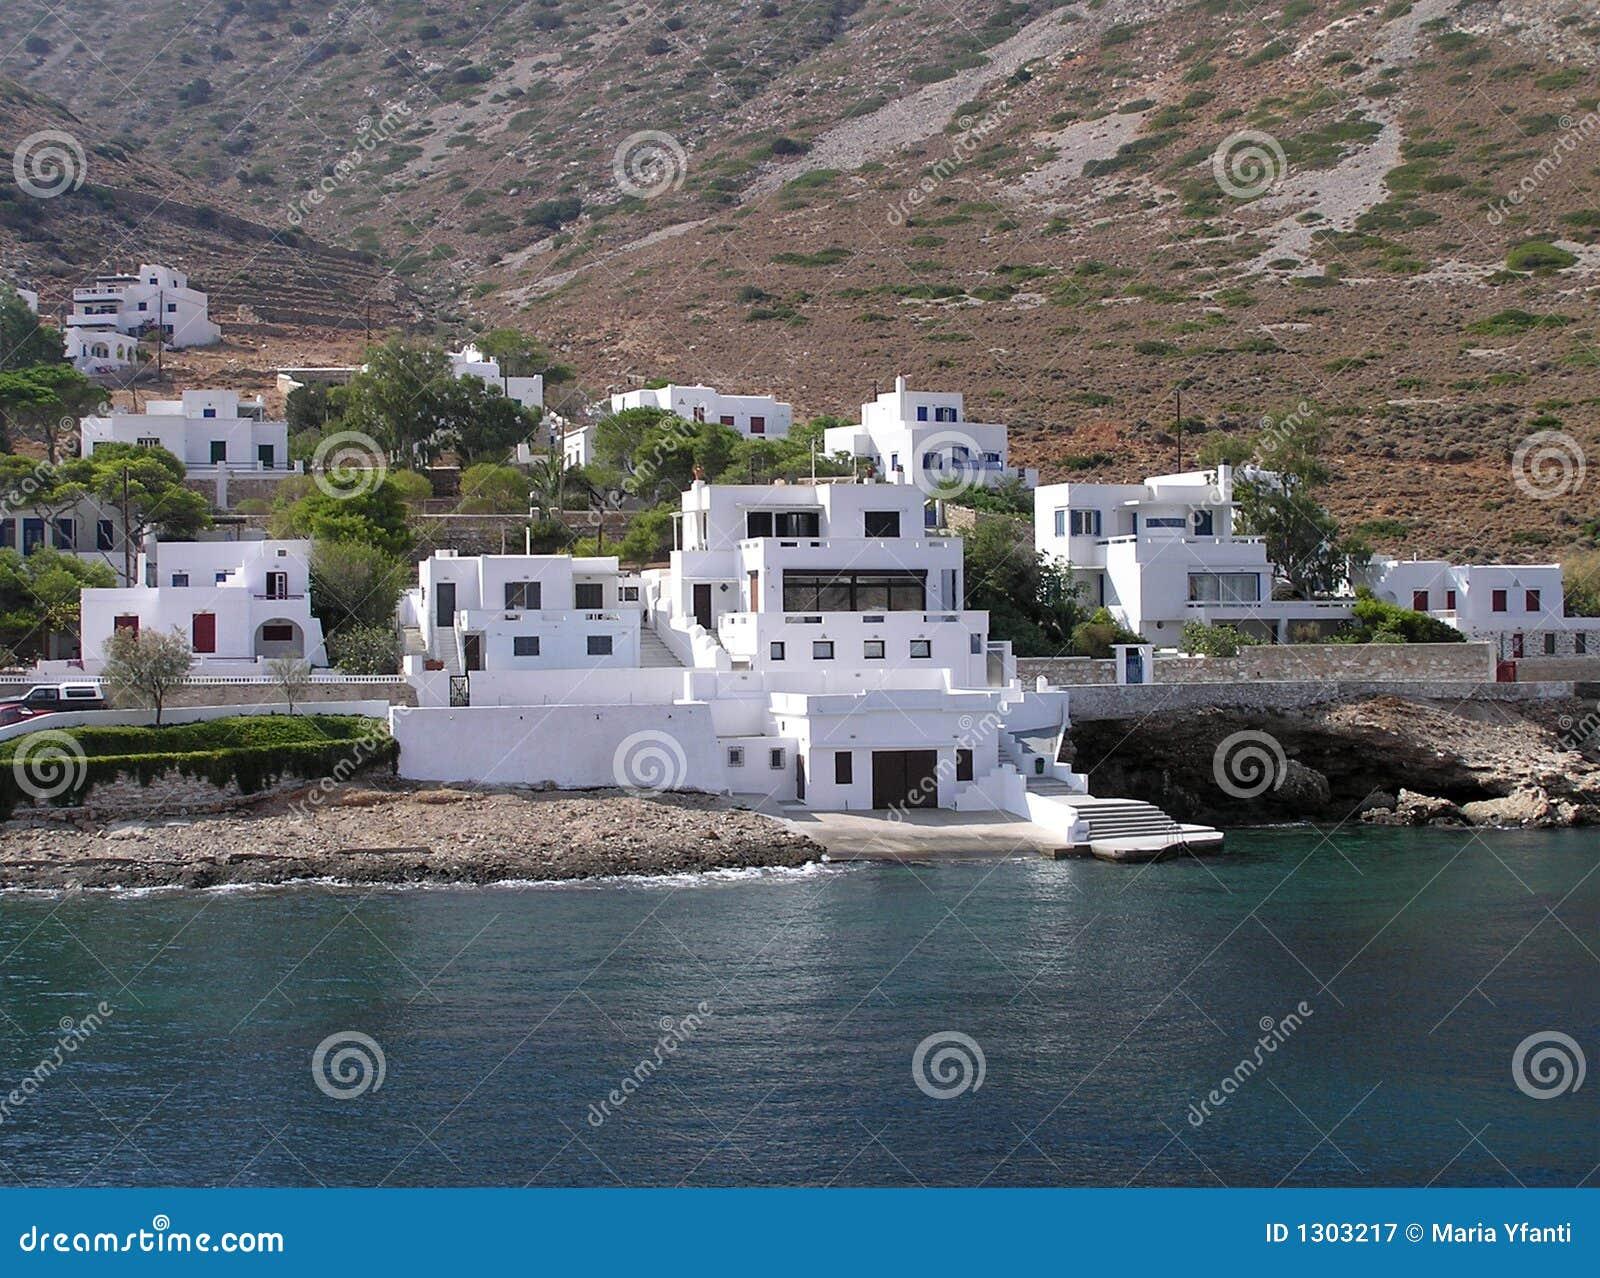 Console de Sifnos, Greece